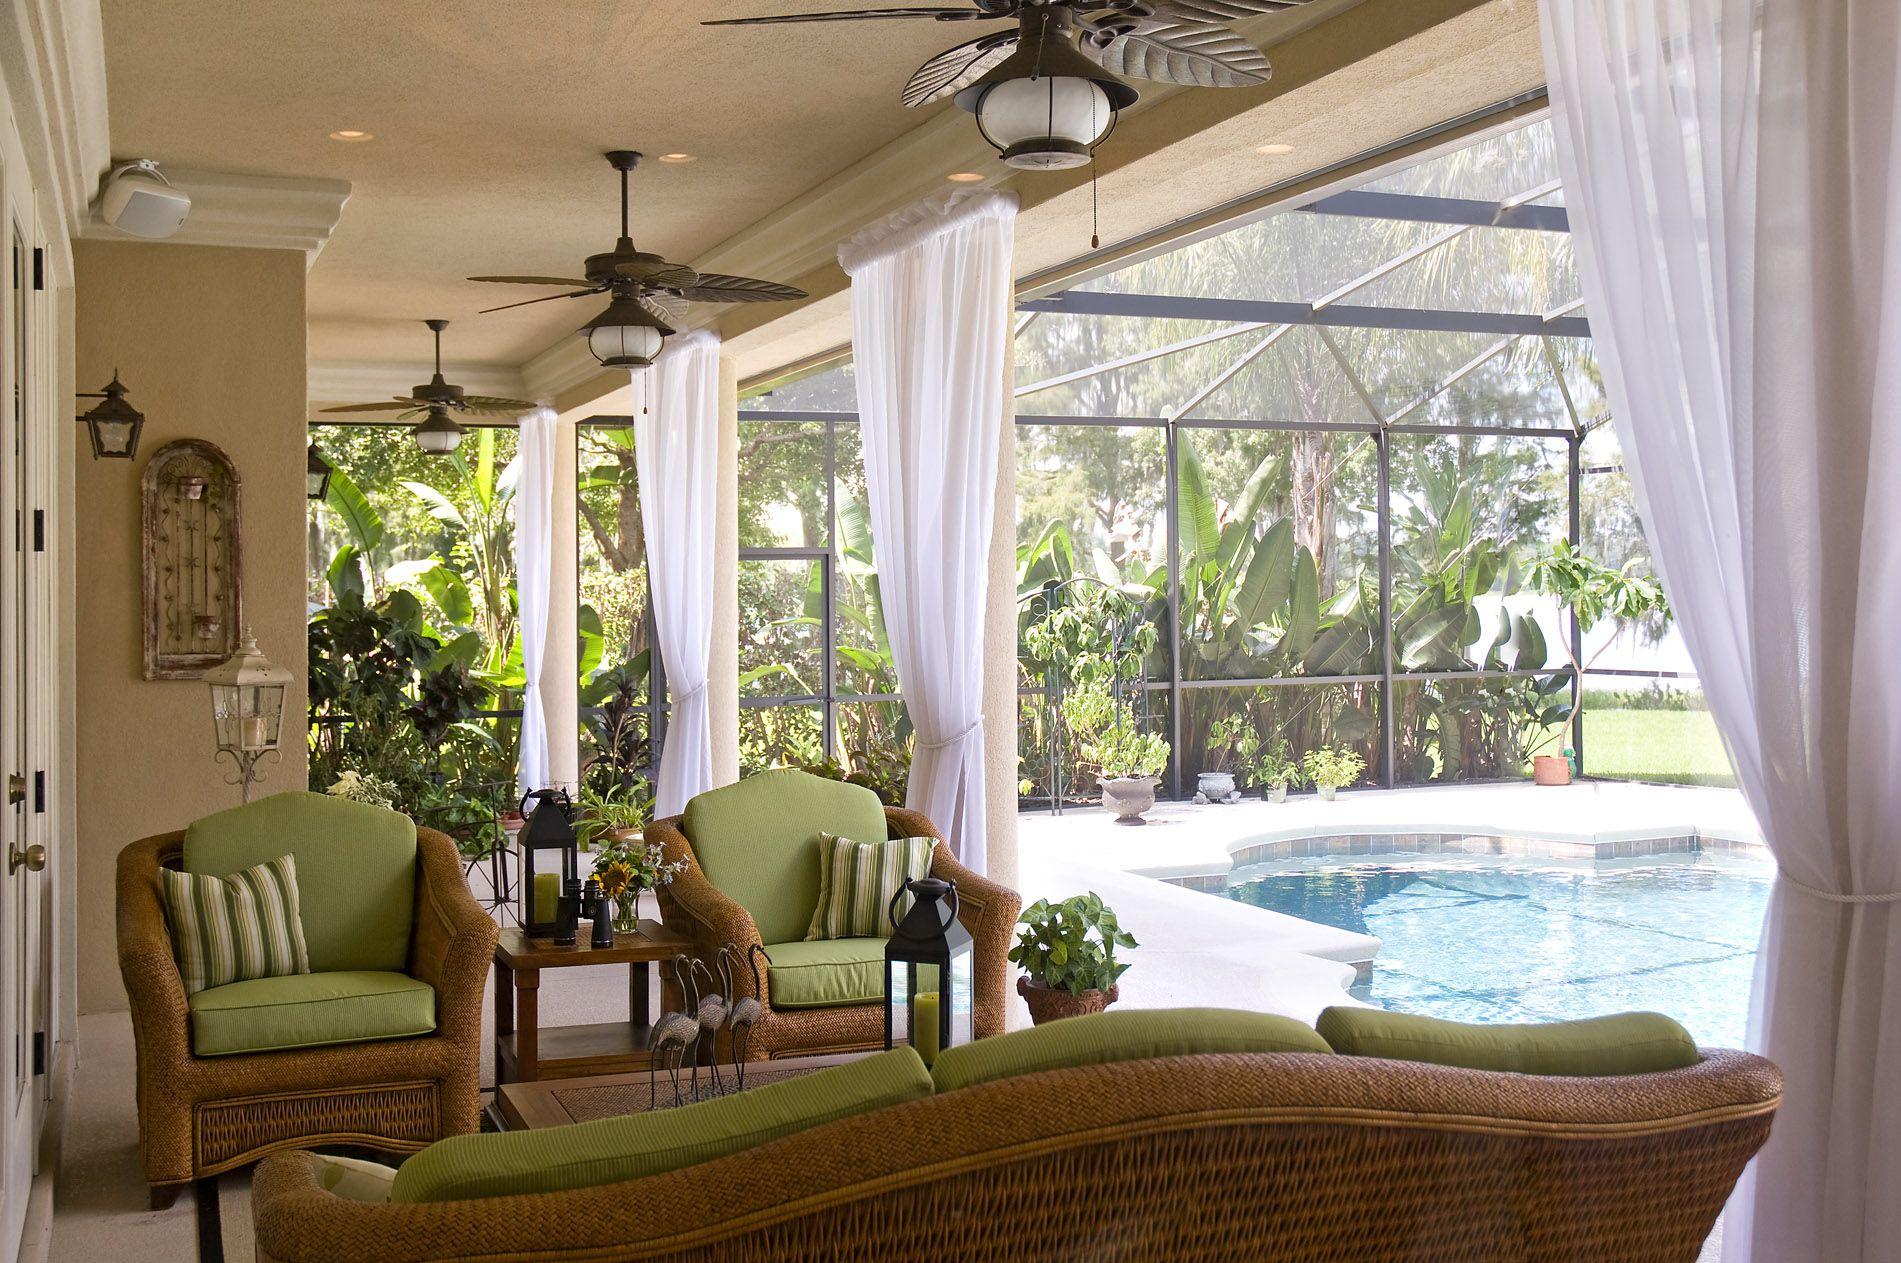 Heidi Sowatsky S Decorating Blog Sunroom Decorating Pool Decor